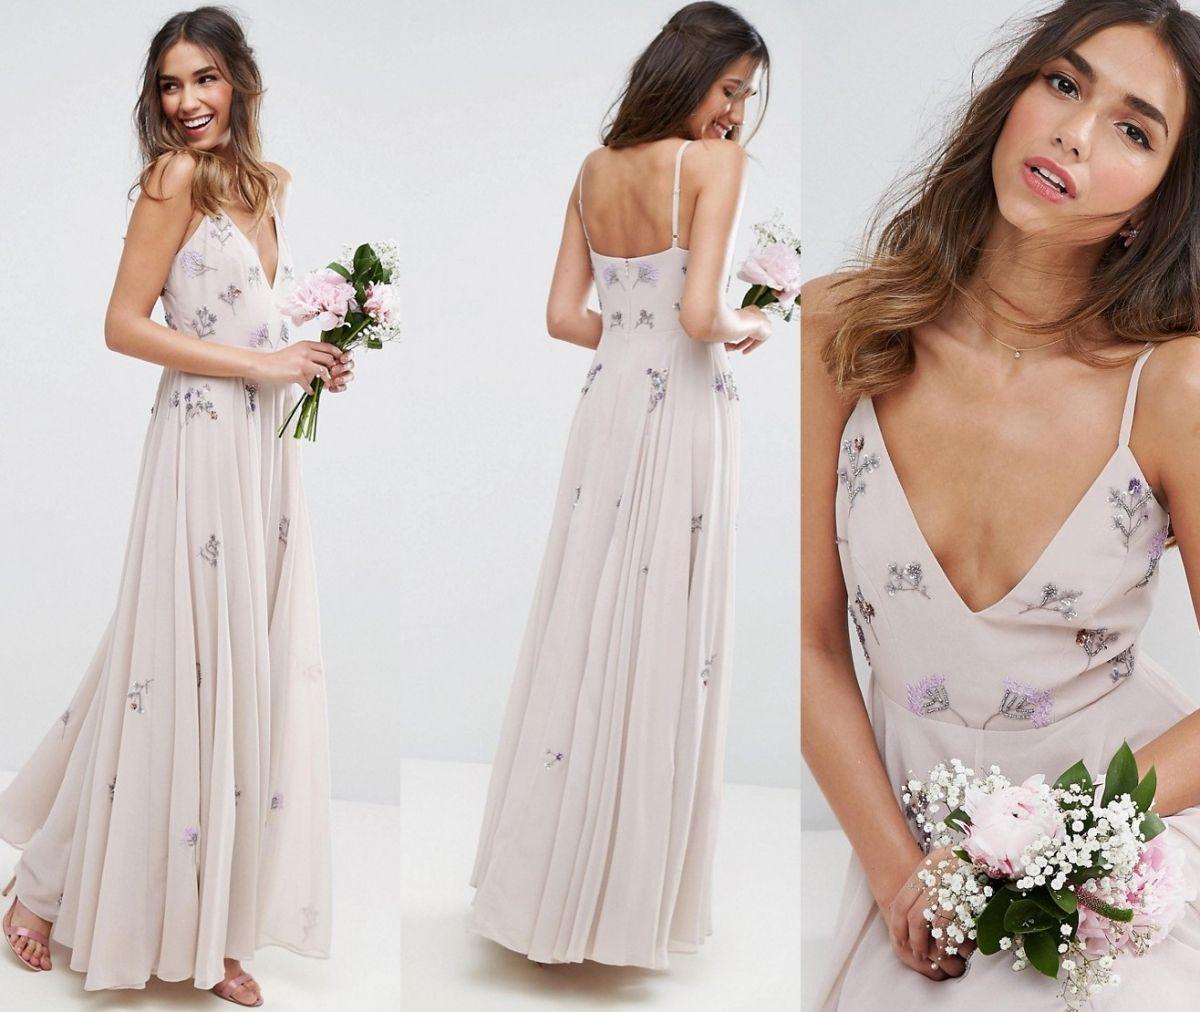 ac21aed486 D-5-5-48 as0 wedding sukienka maxi rozmiar 46